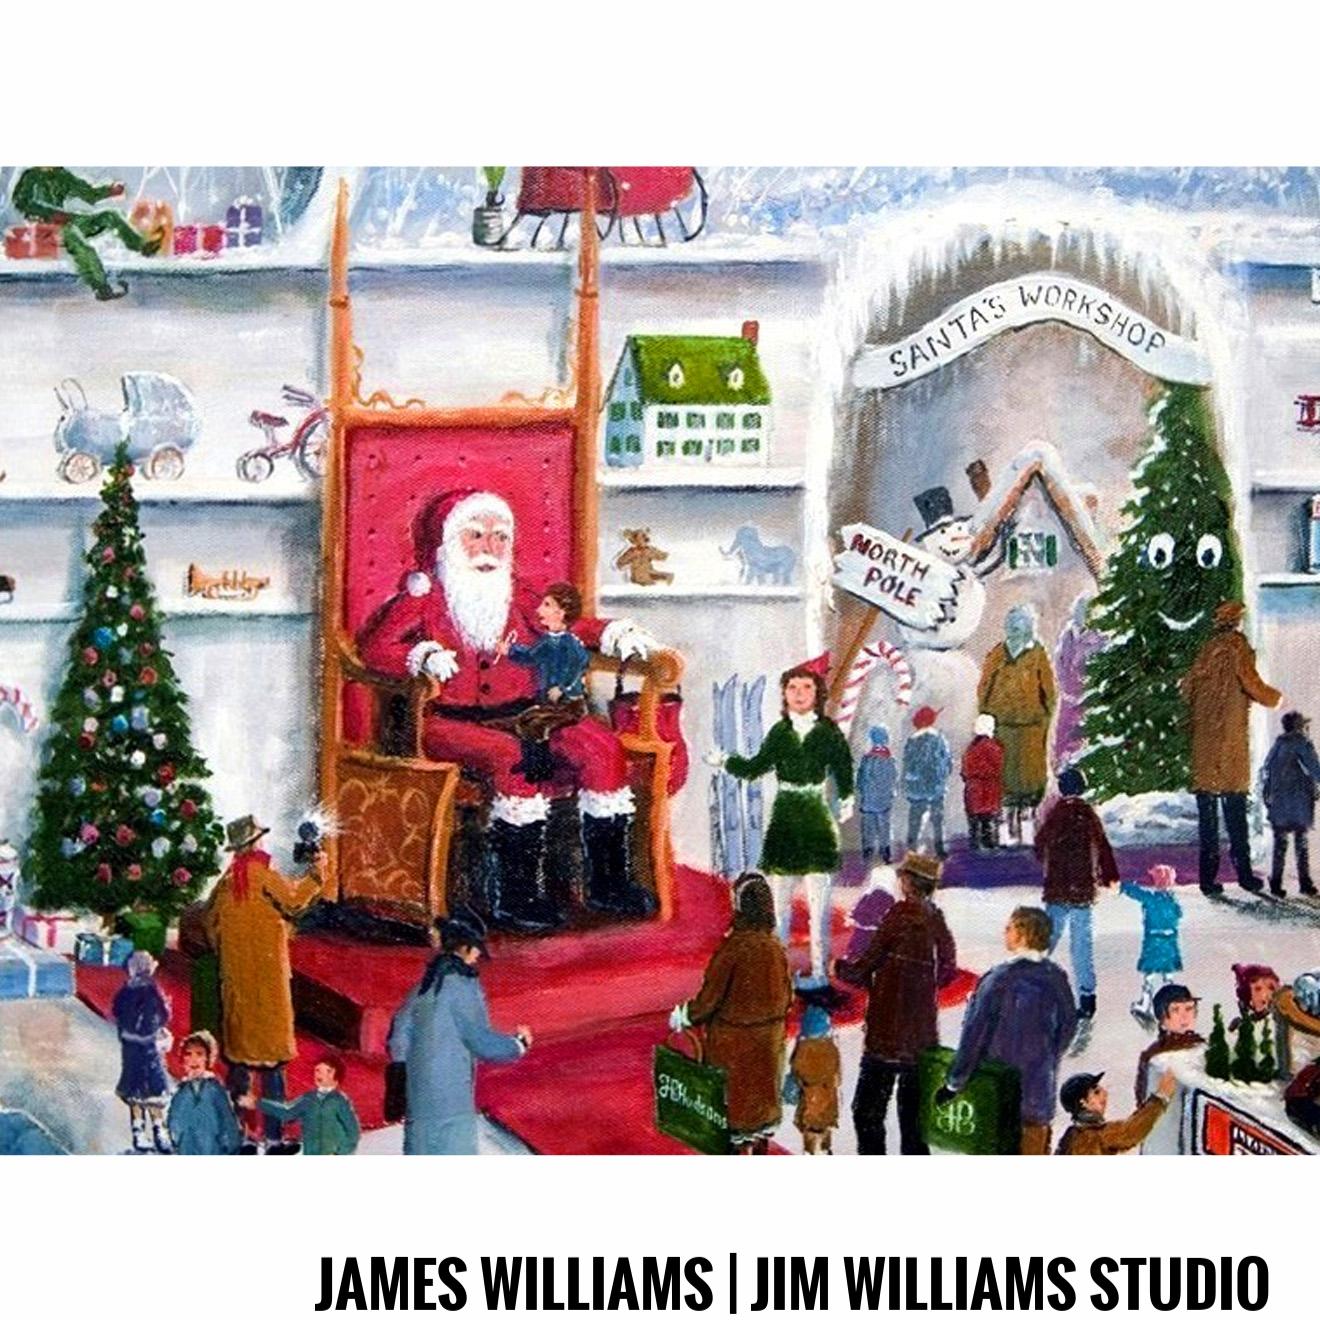 James Williams | Jim Williams Studio